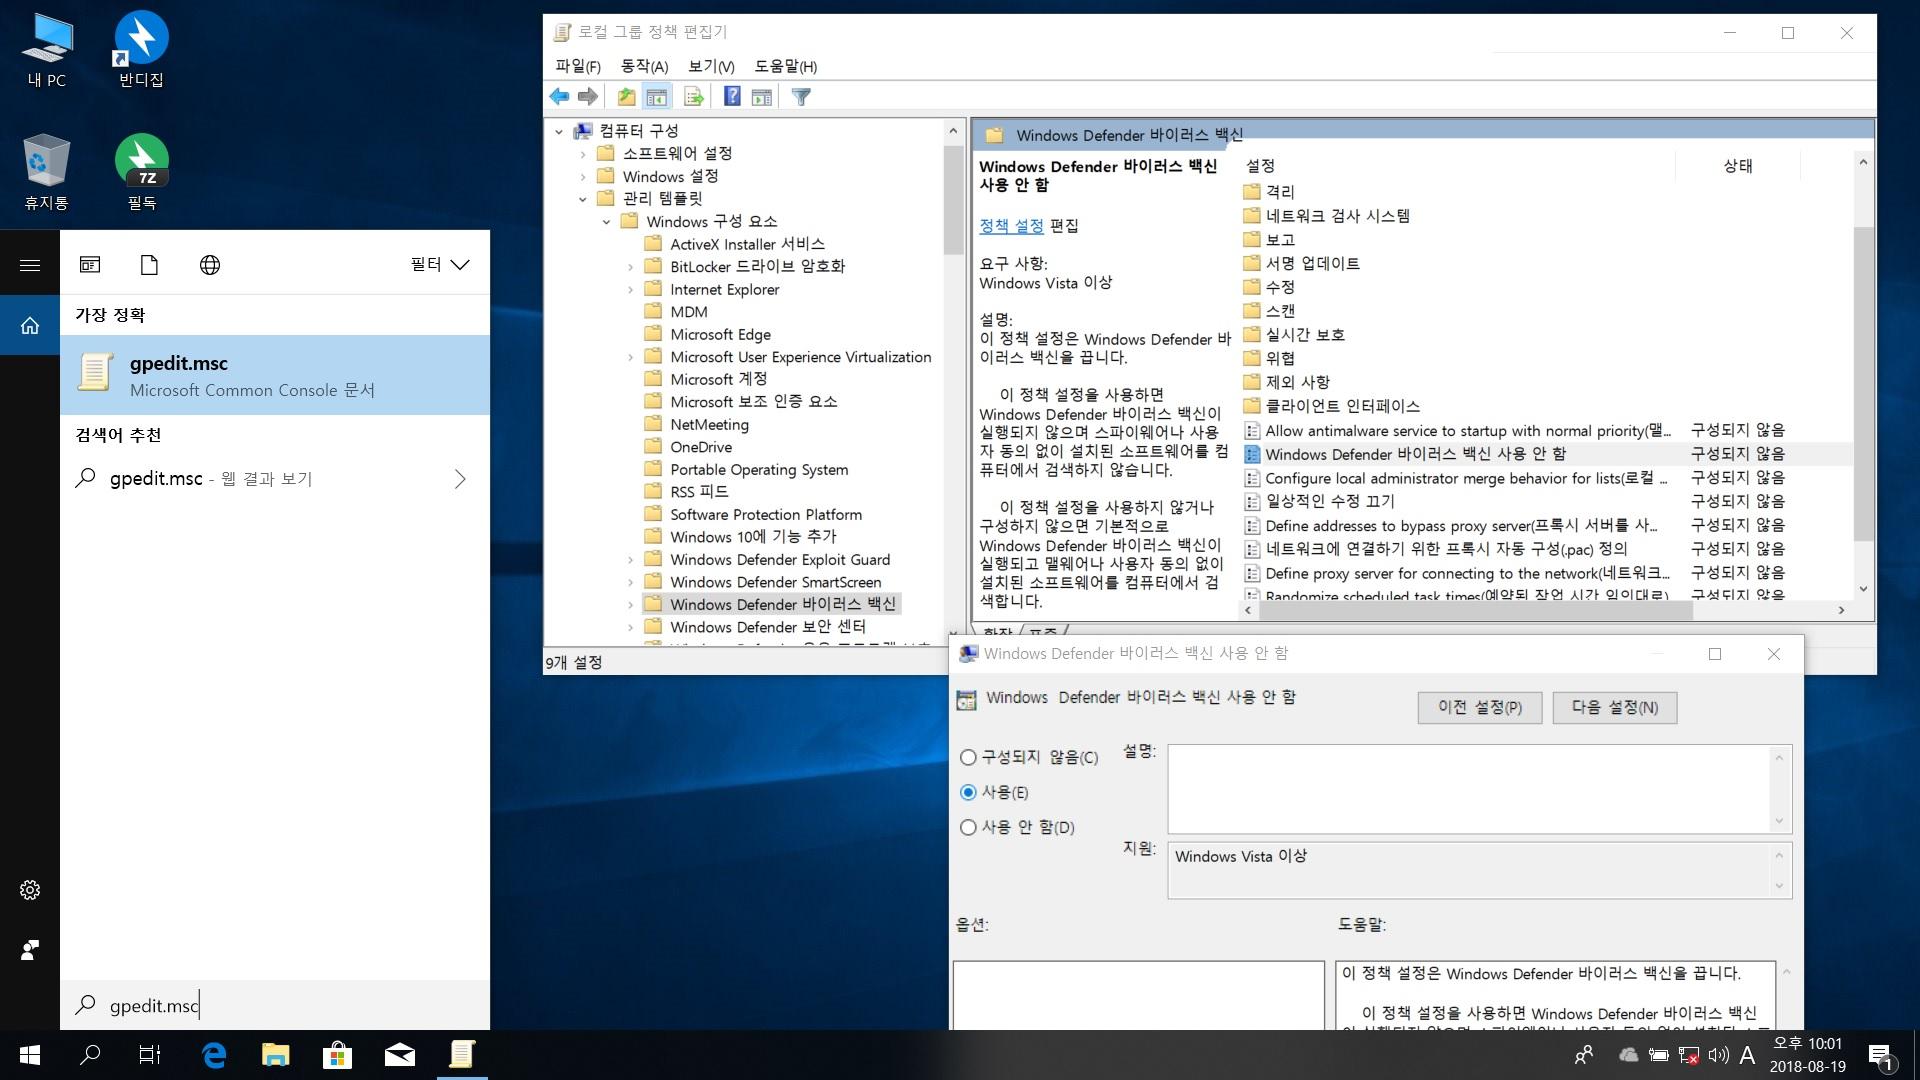 OS2.jpg